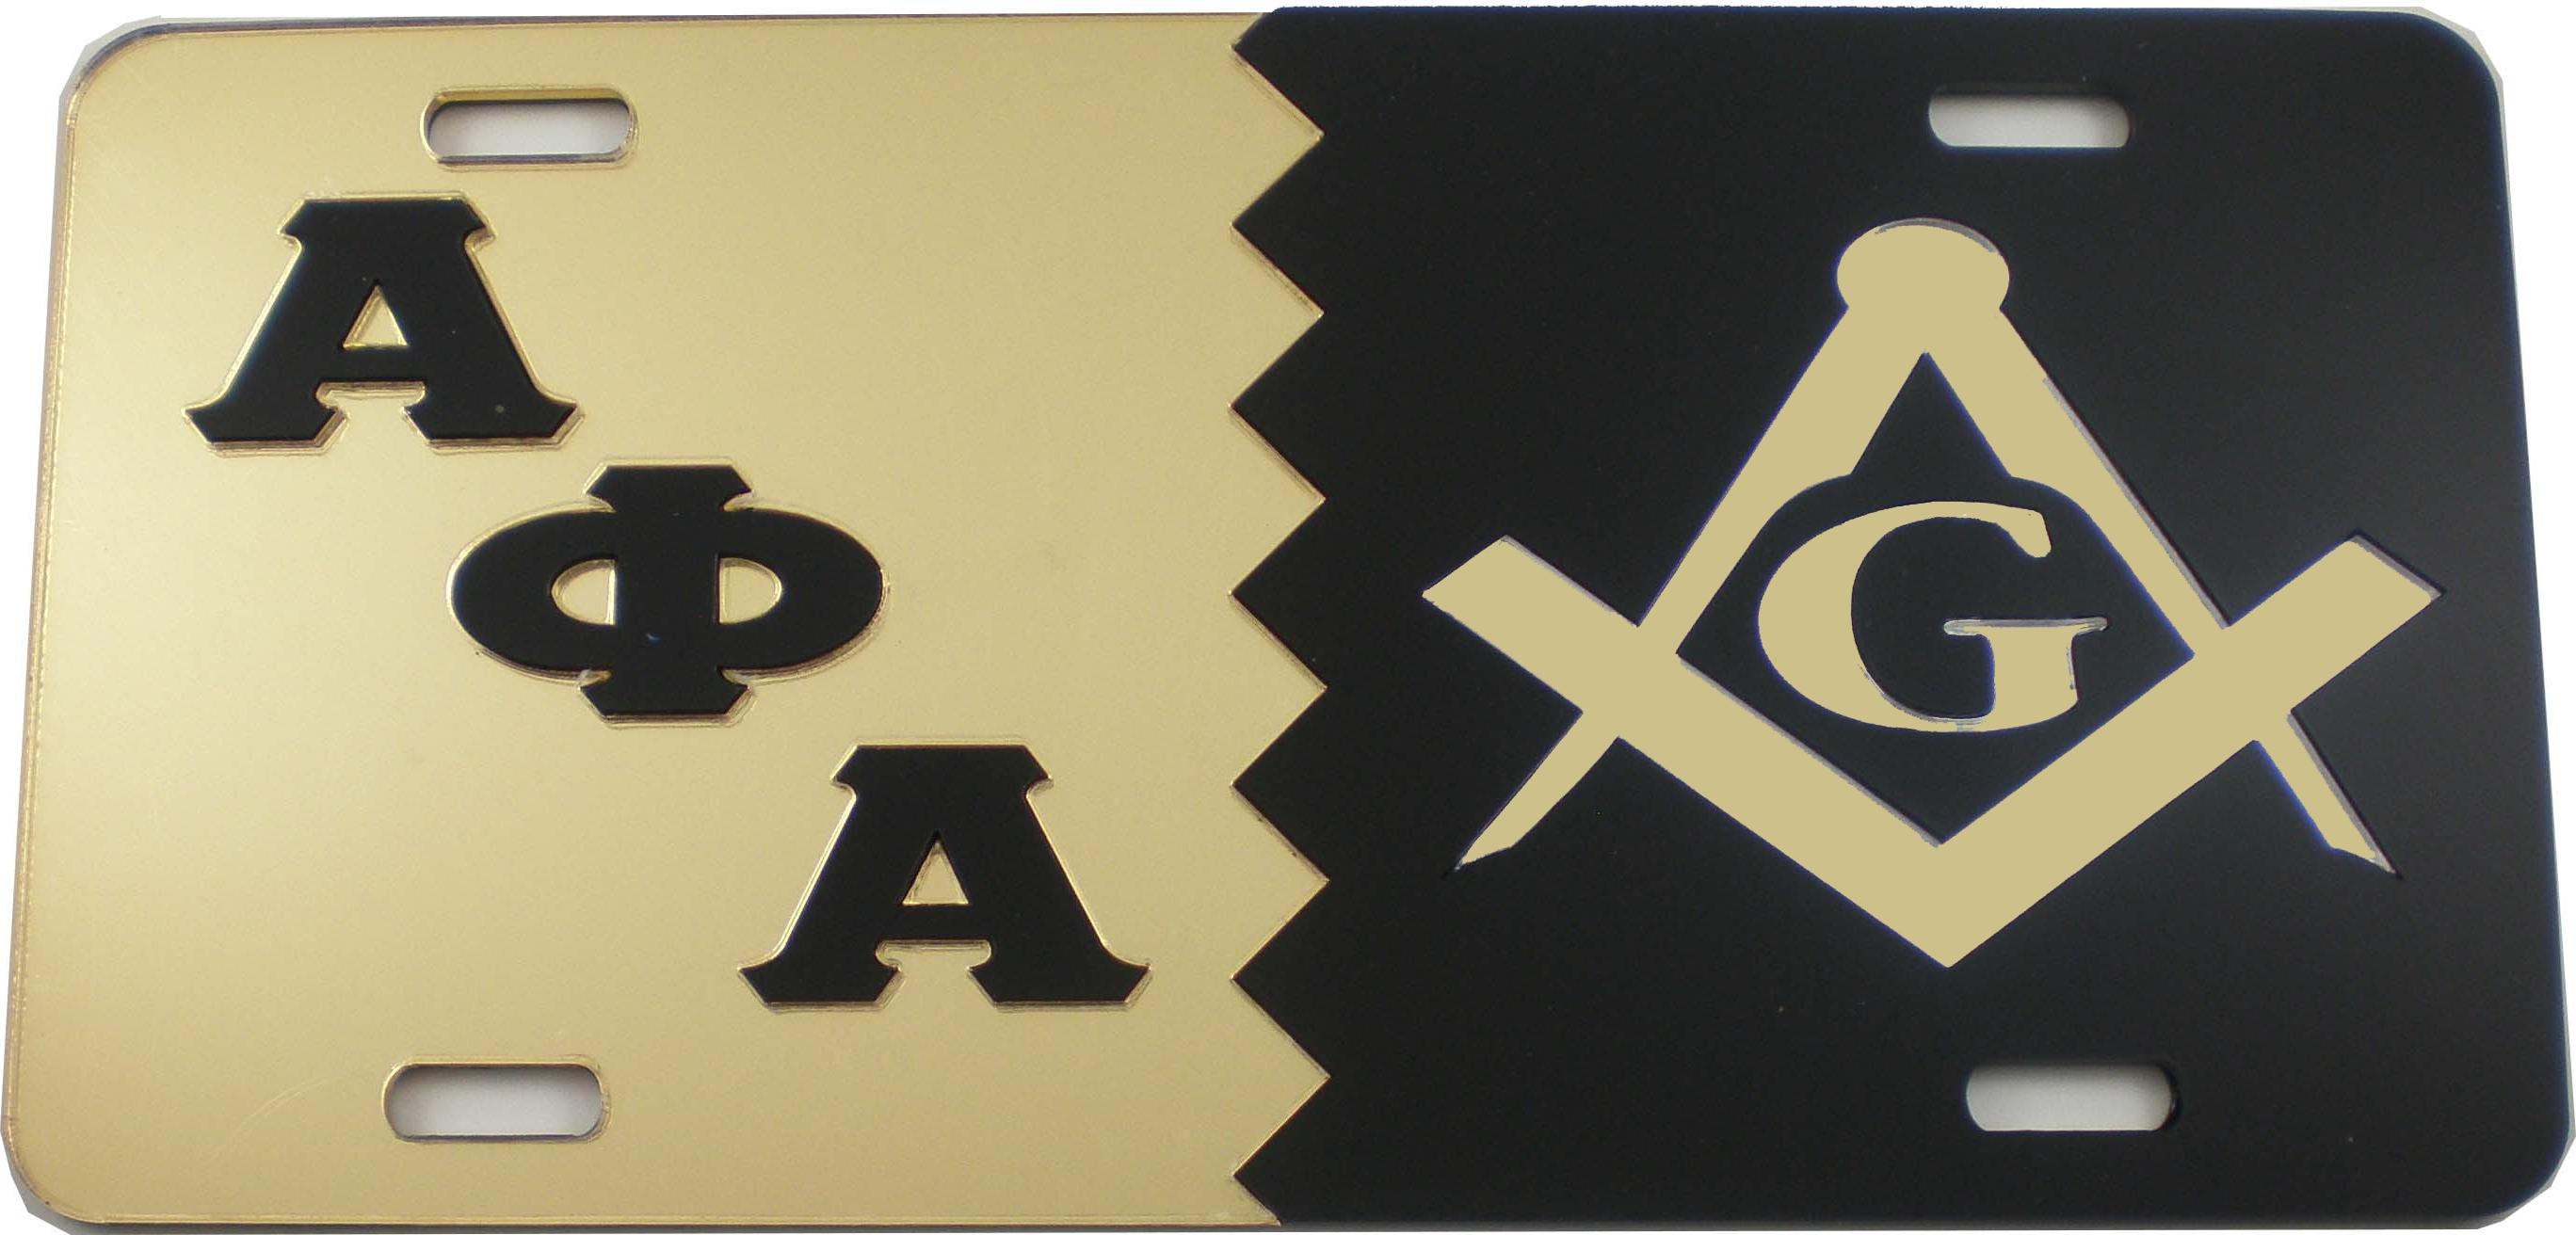 Alpha phi alpha mason split mirror license plate ebay alpha phi alpha mason split mirror license plate biocorpaavc Images